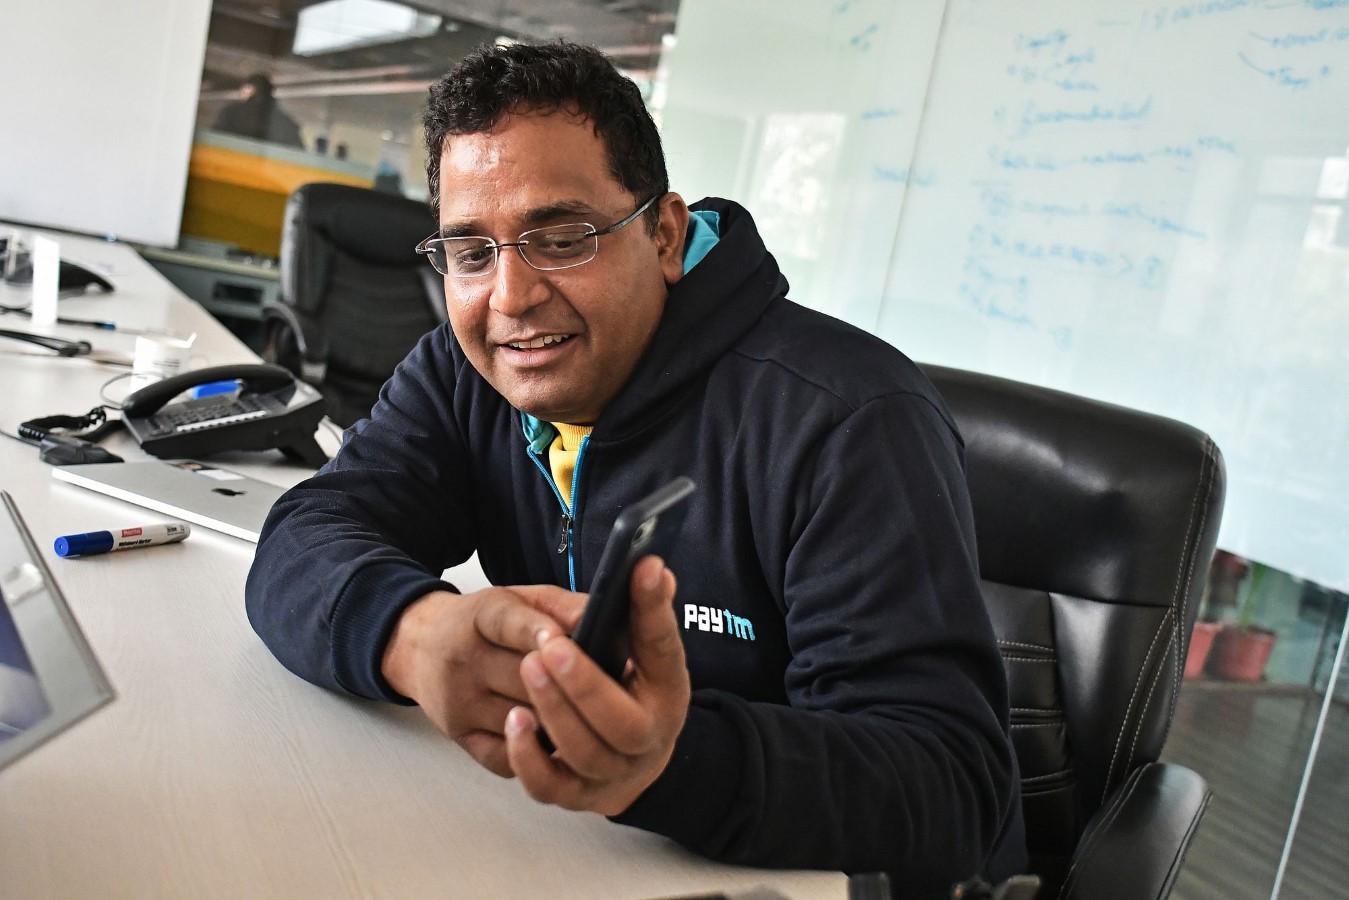 Vijay Shekhar Sharma, founder and chairman of One97 Communications Ltd., CEO of PayTM